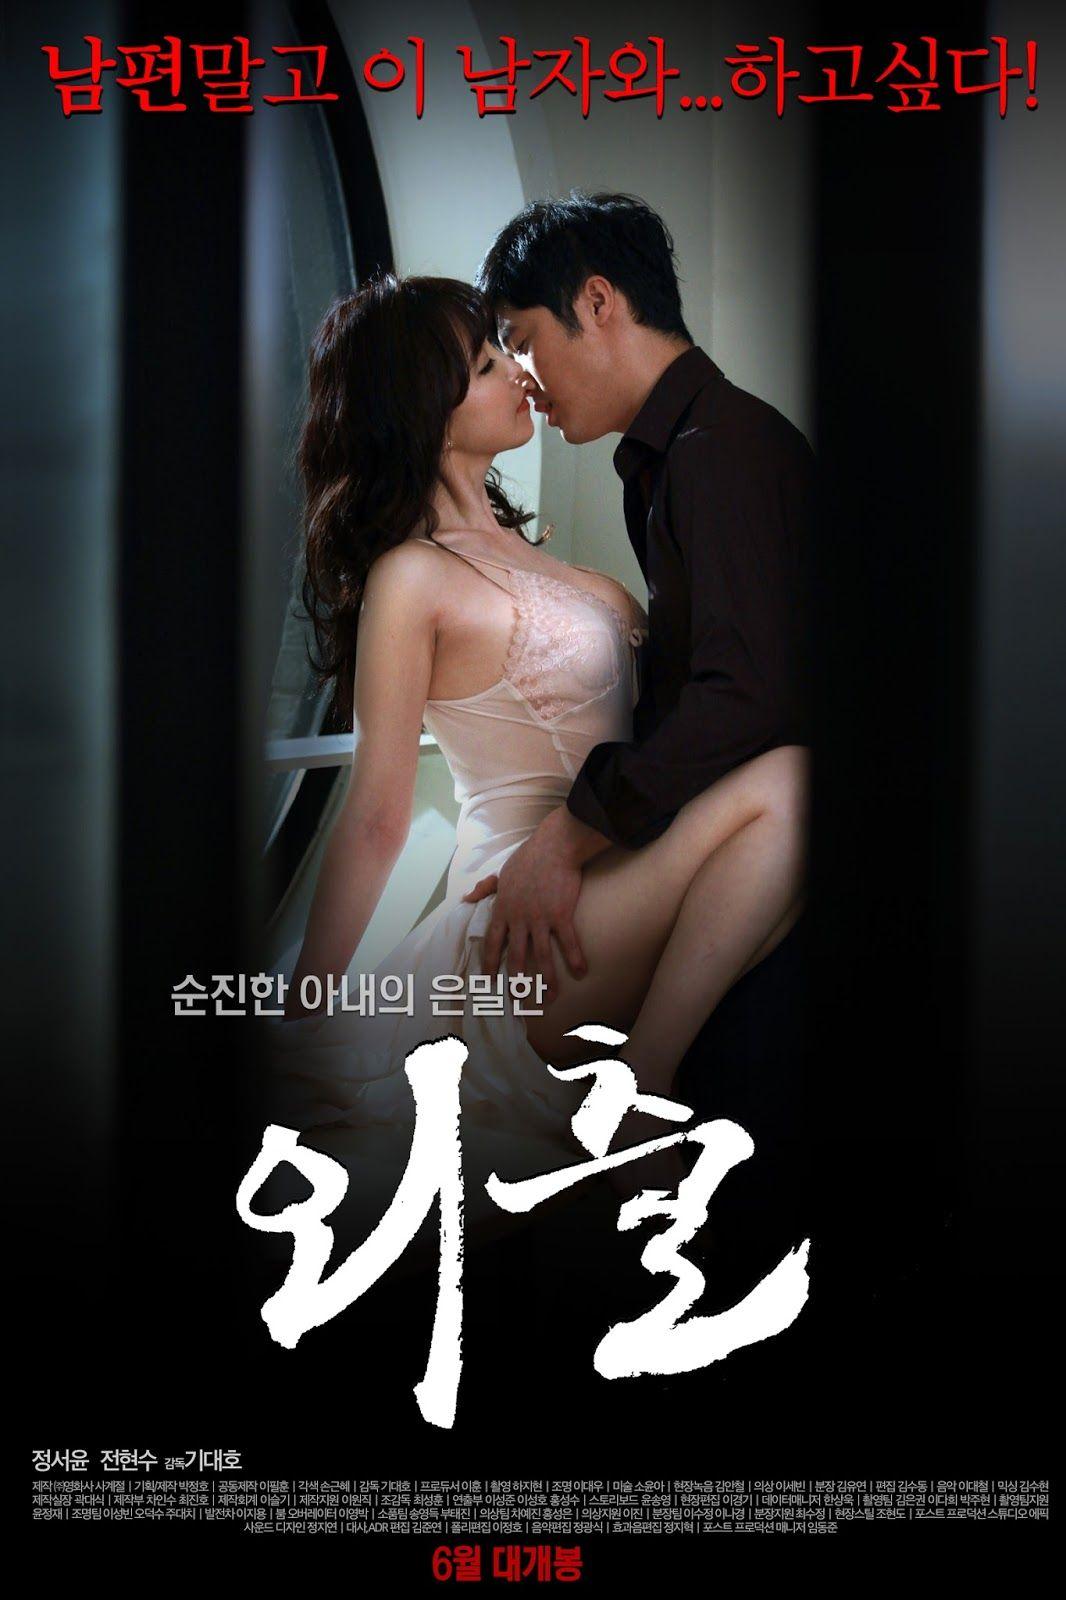 seks-film-aziatskiy